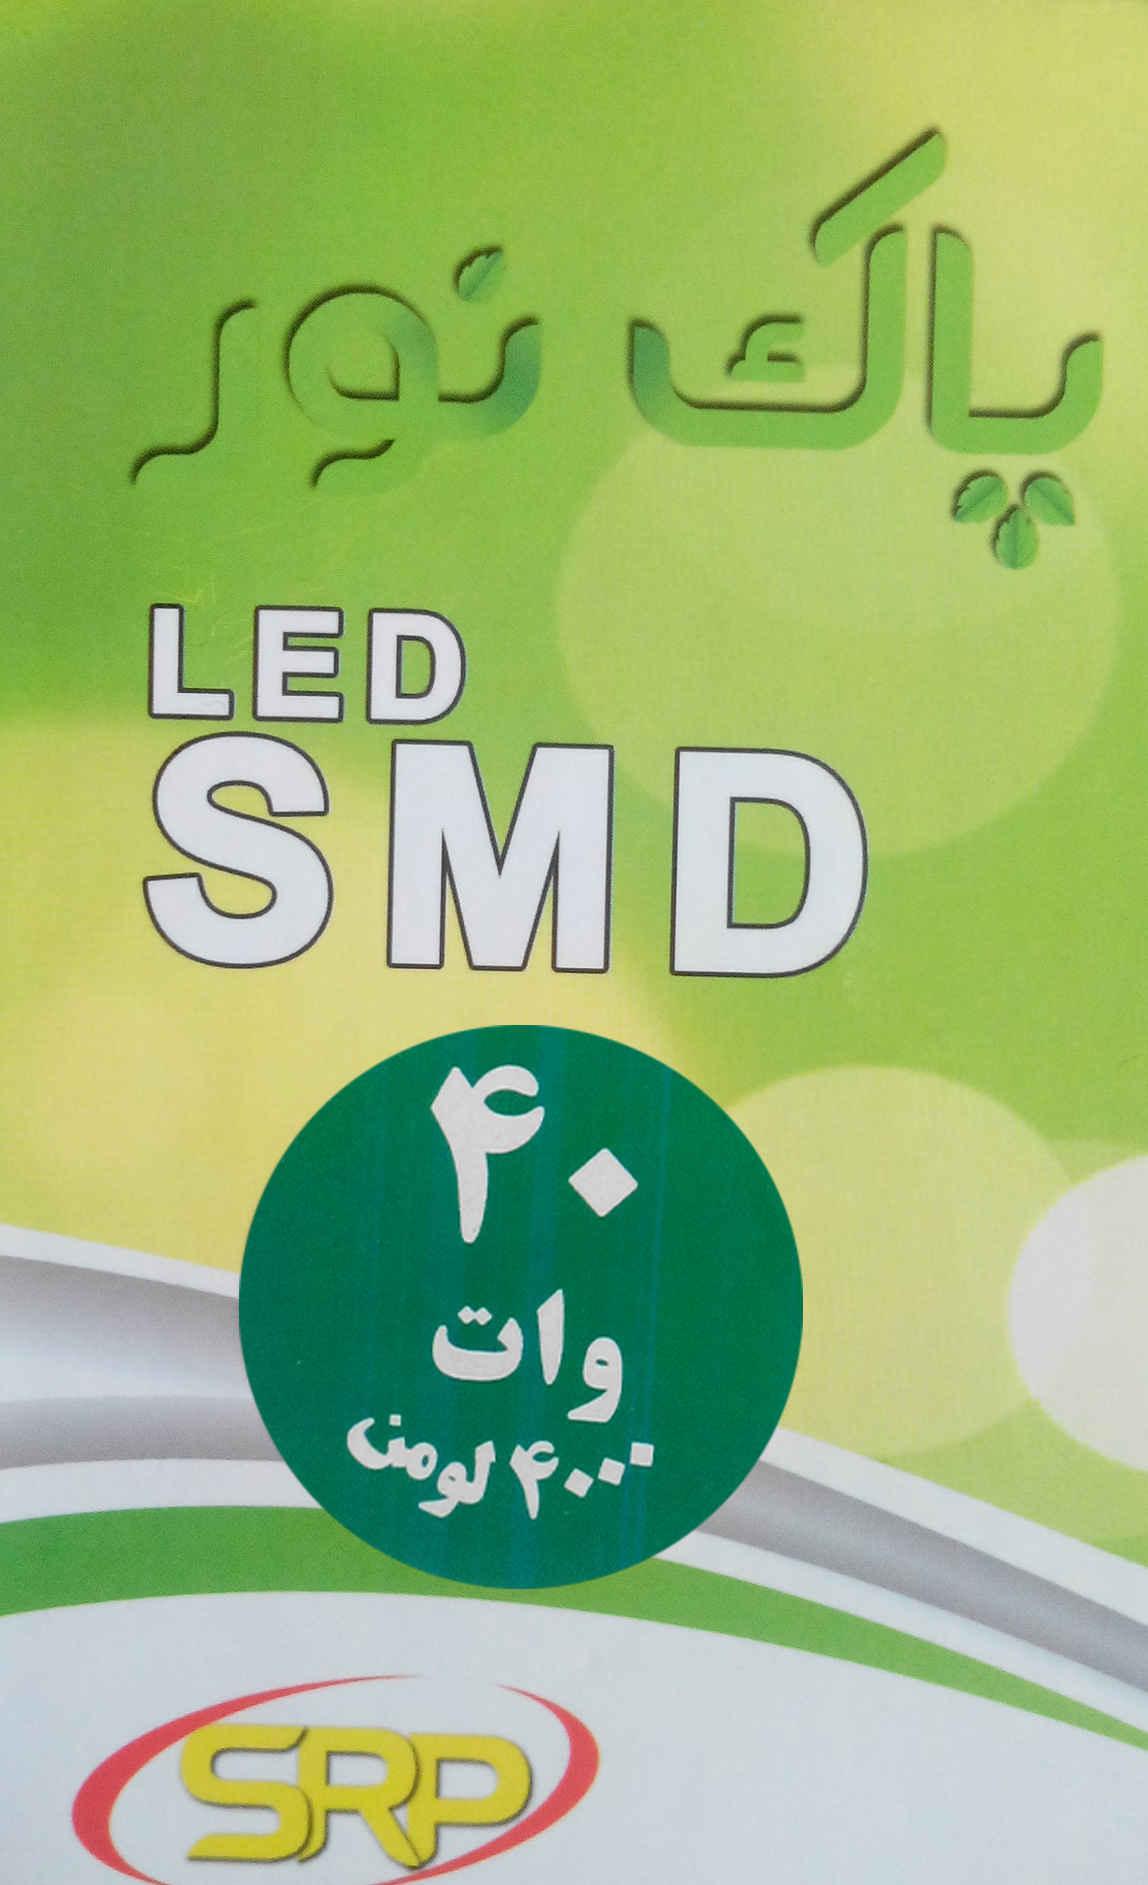 لامپ اس ام دی پاک نور 40 وات